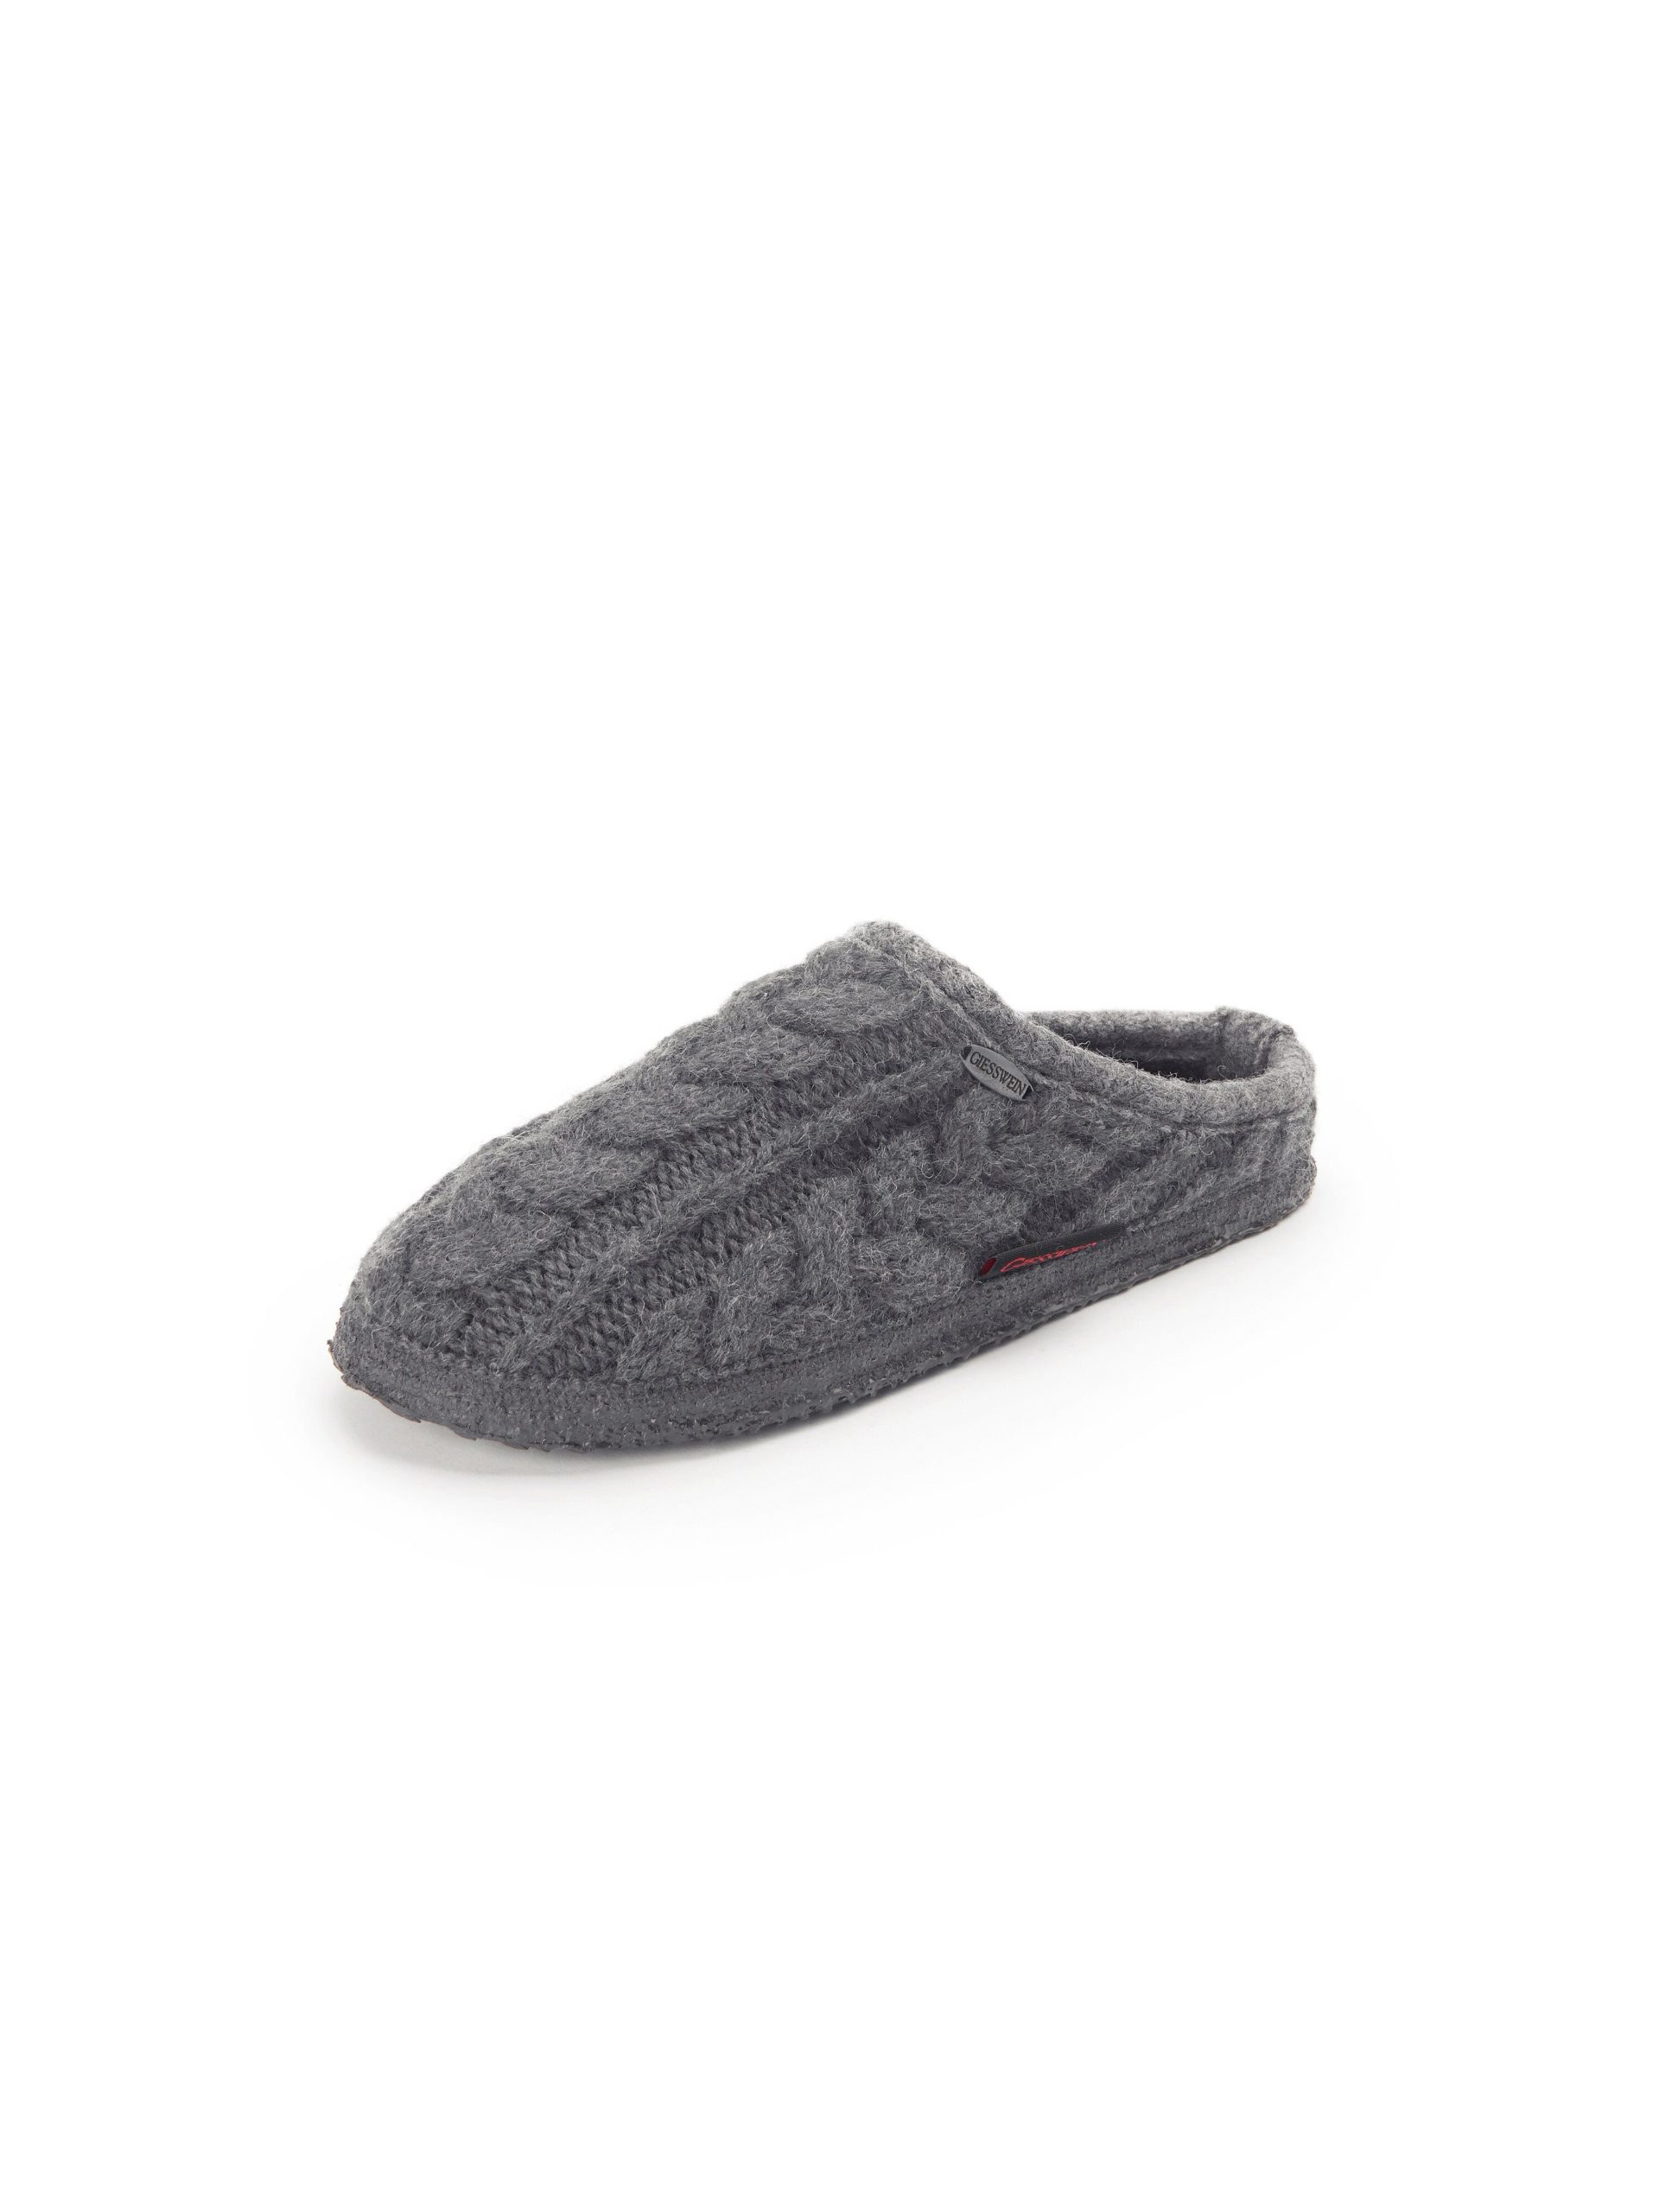 Pantoffels Van Giesswein grijs Kopen